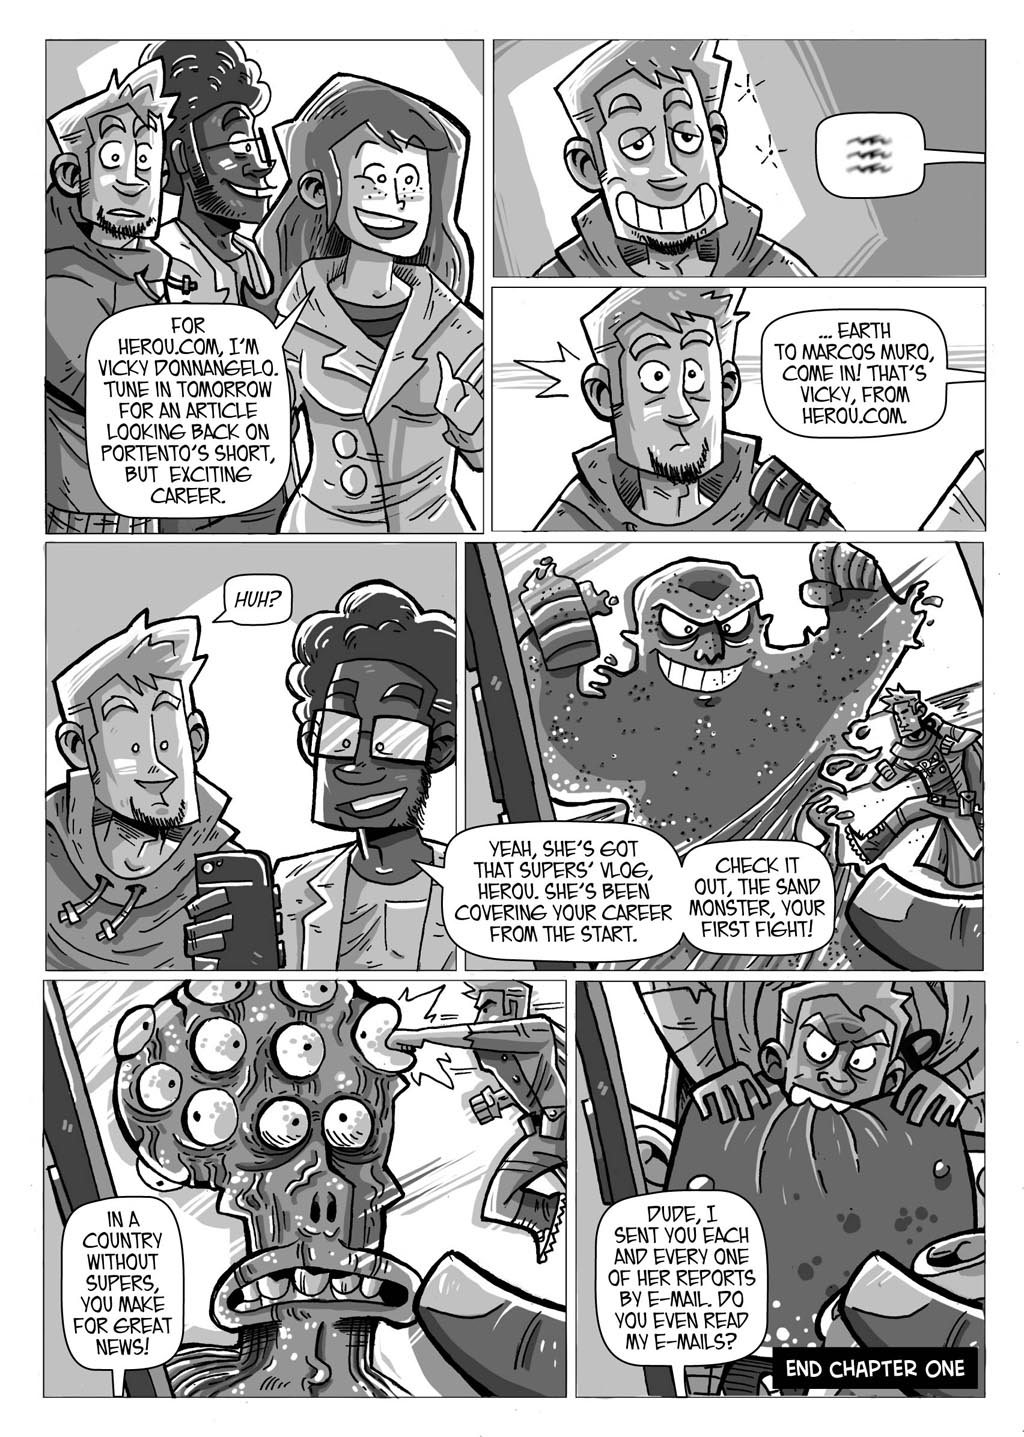 Portent - Page 8